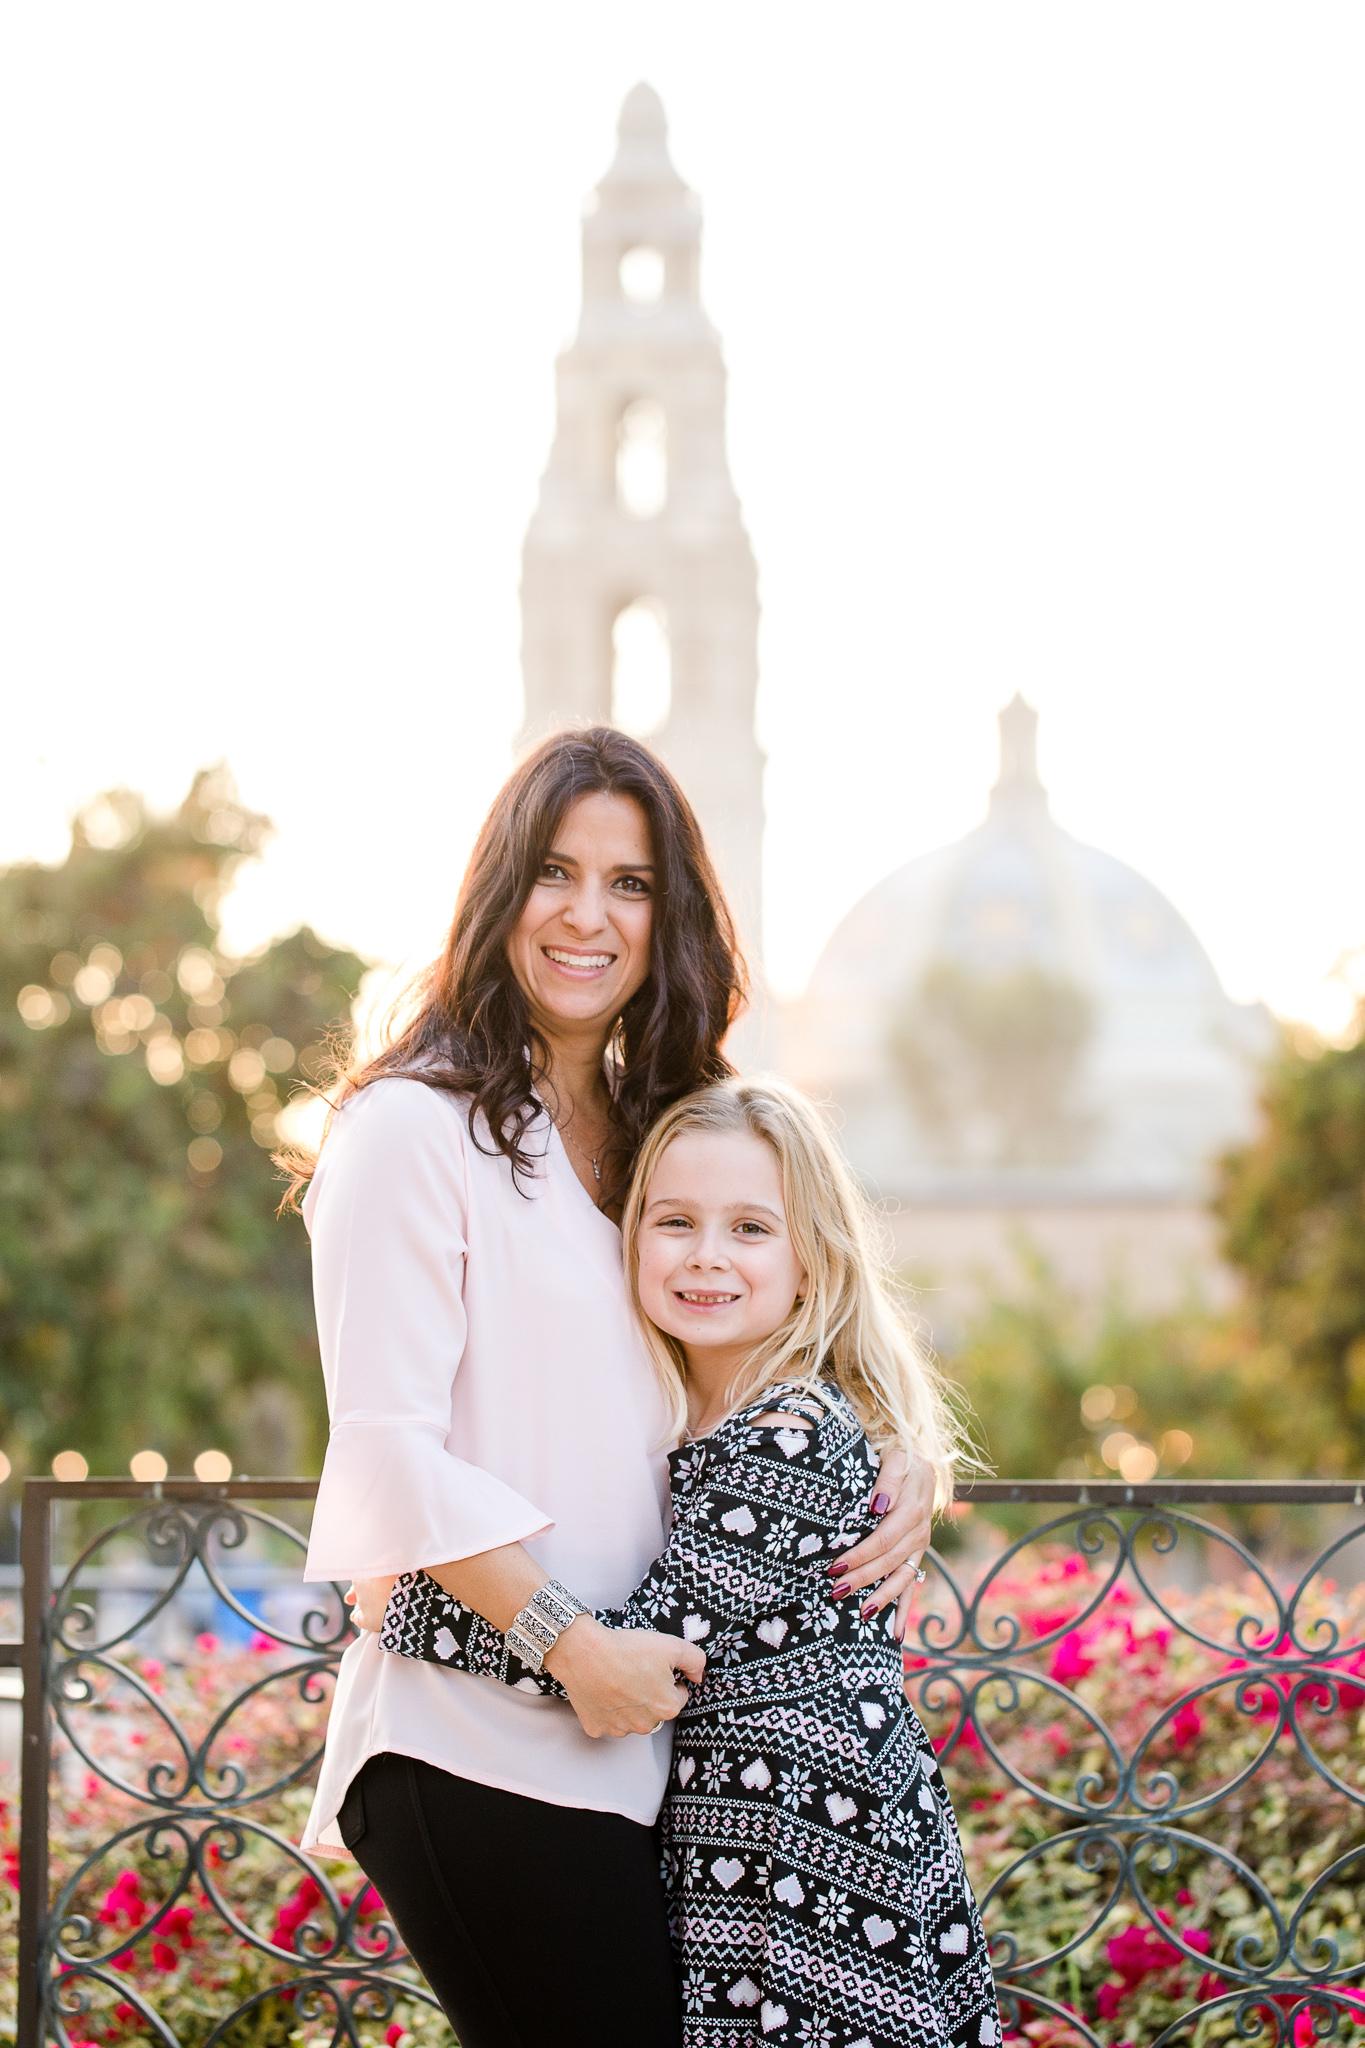 sandiegofamilyphotographergosshermeyer-1.jpg